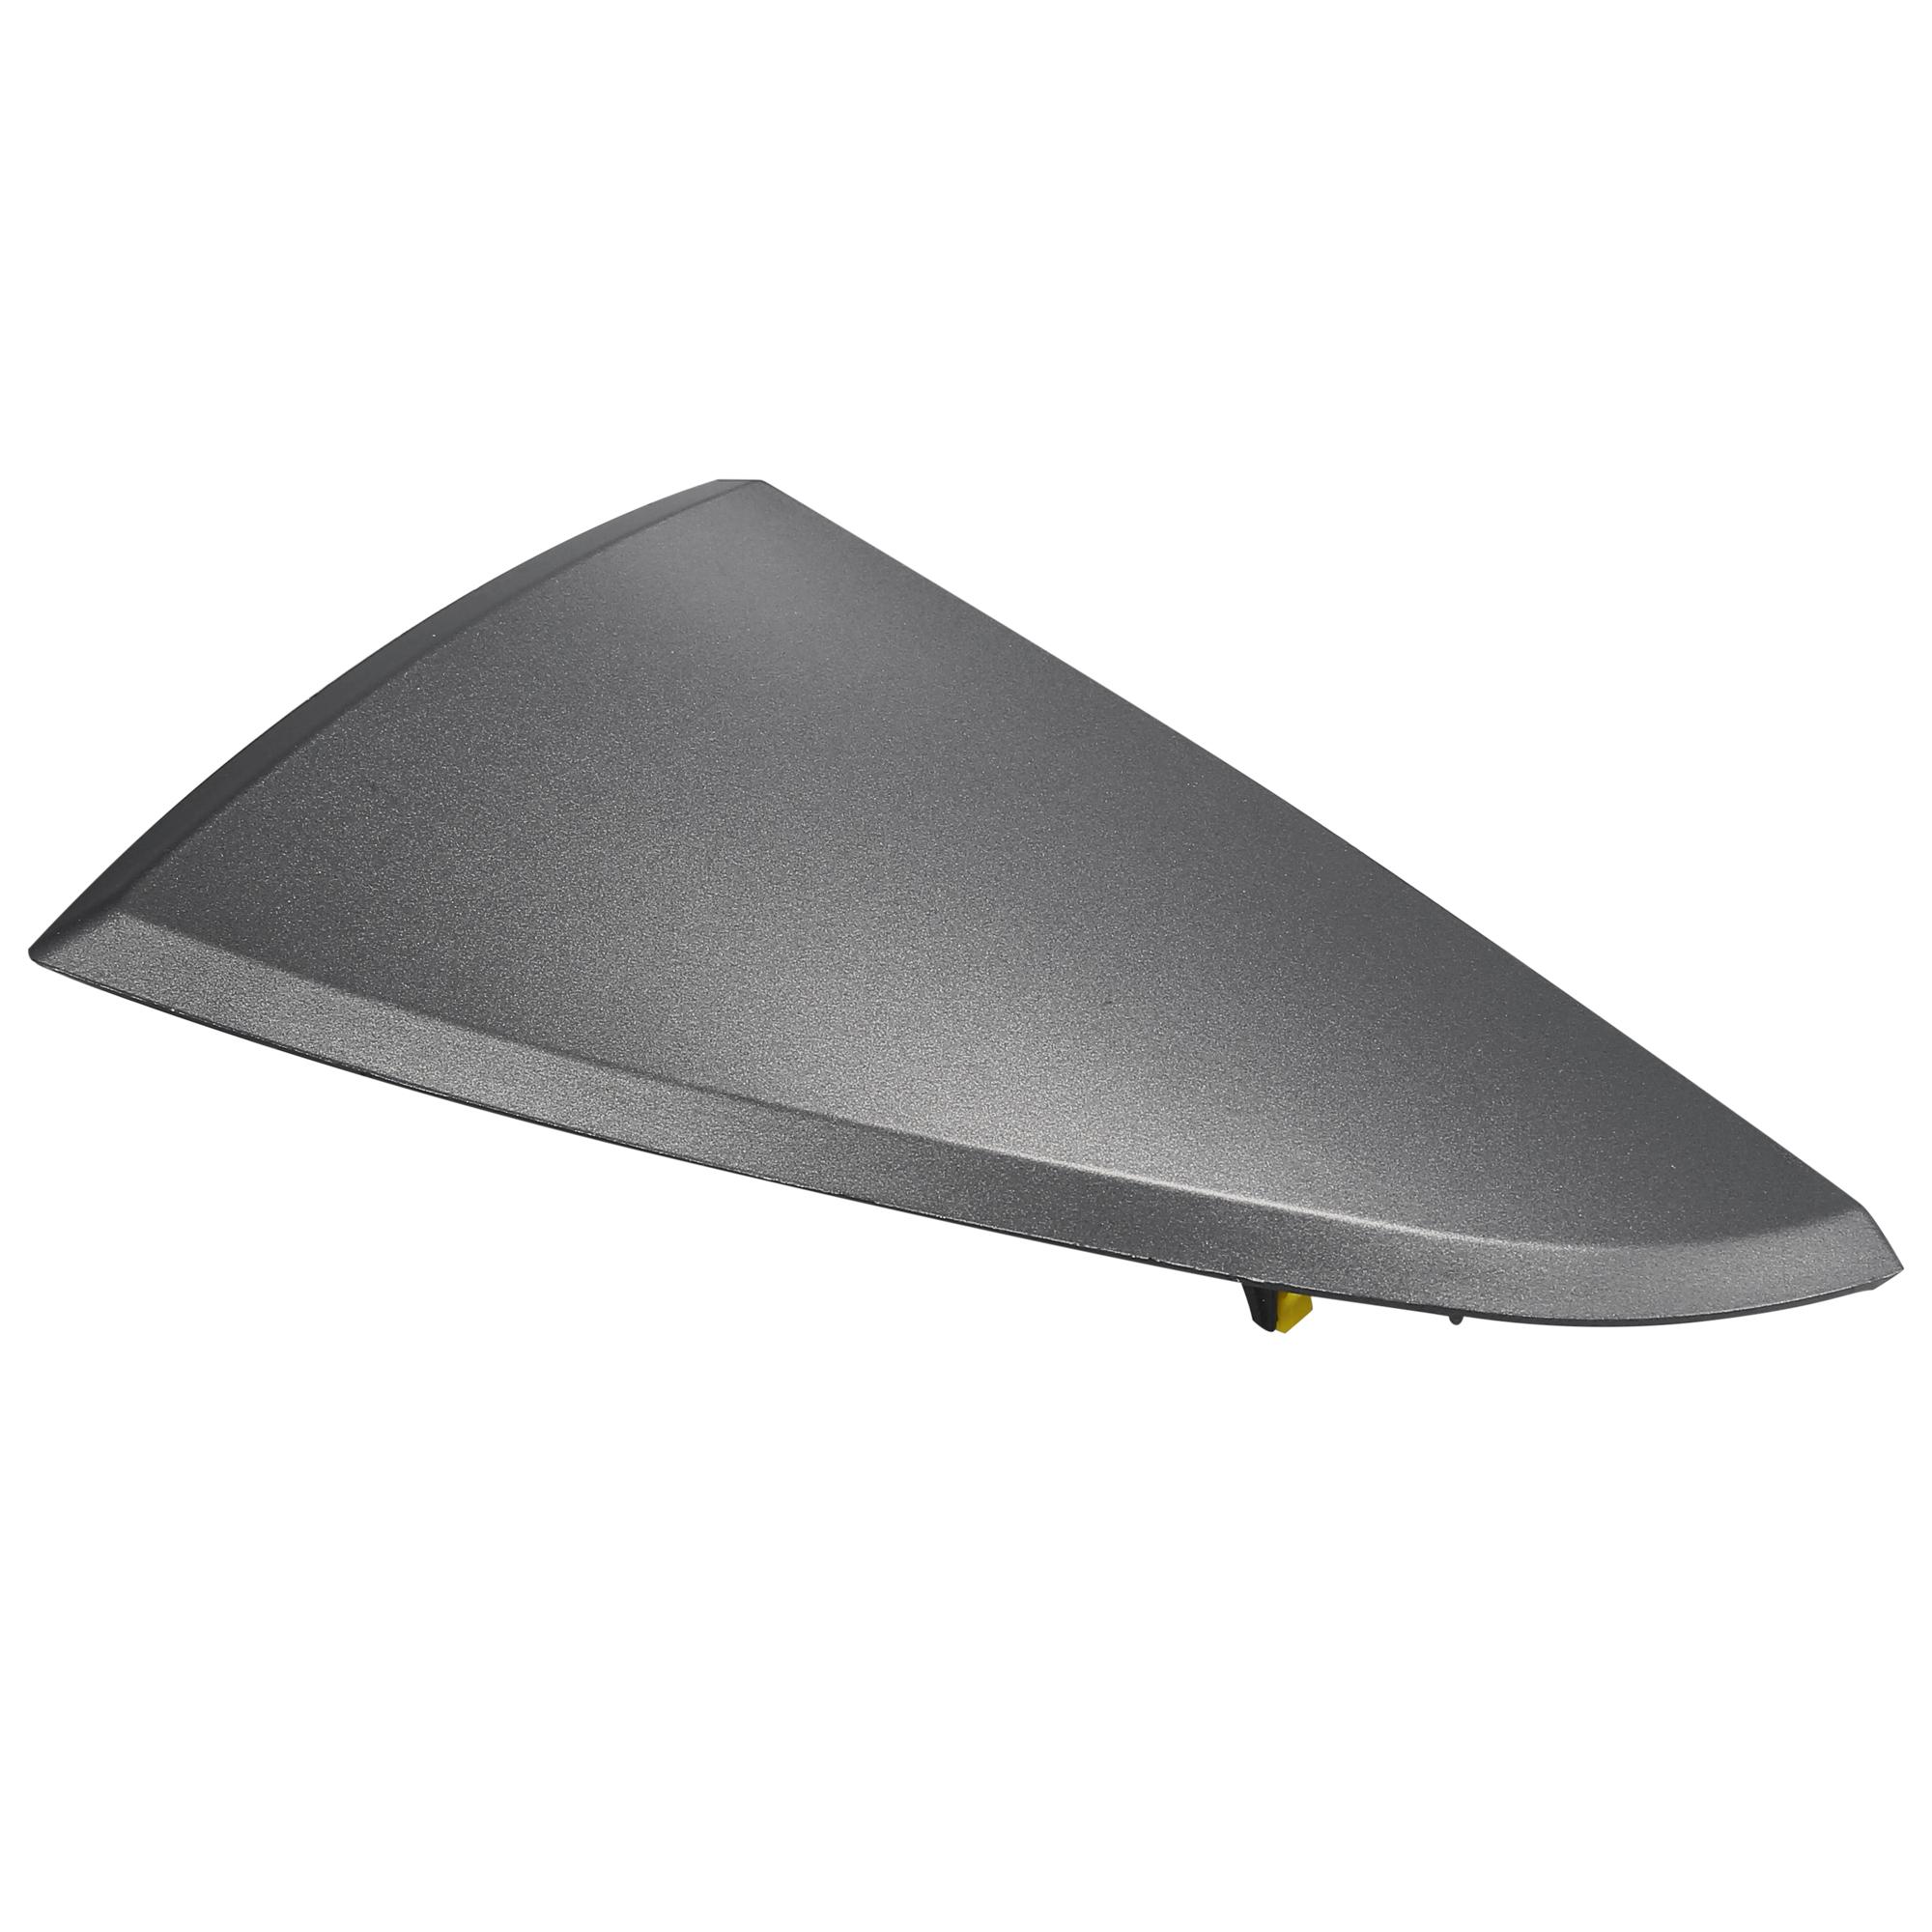 Titanium Tone Dashboard Center Trim Cover BAF04428A5 for Ford Falcon BA BF 02-11